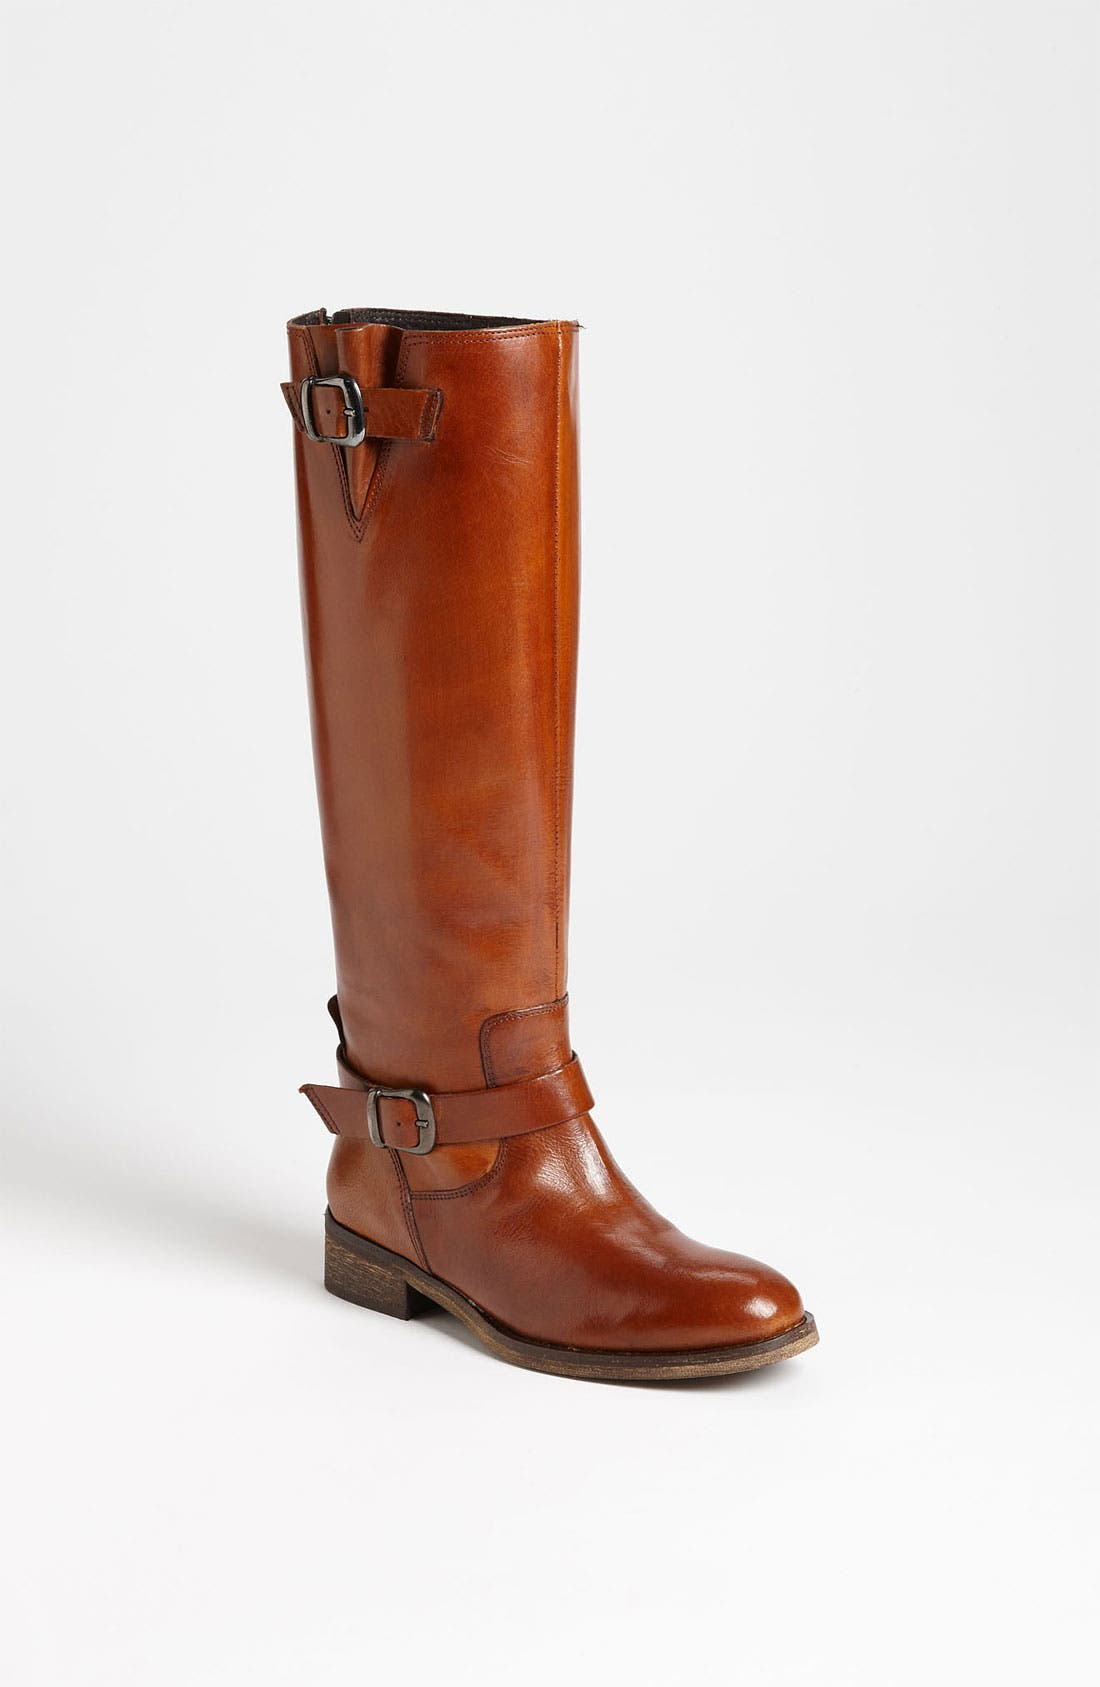 Alternate Image 1 Selected - ALDO 'Laverdiere' Boot